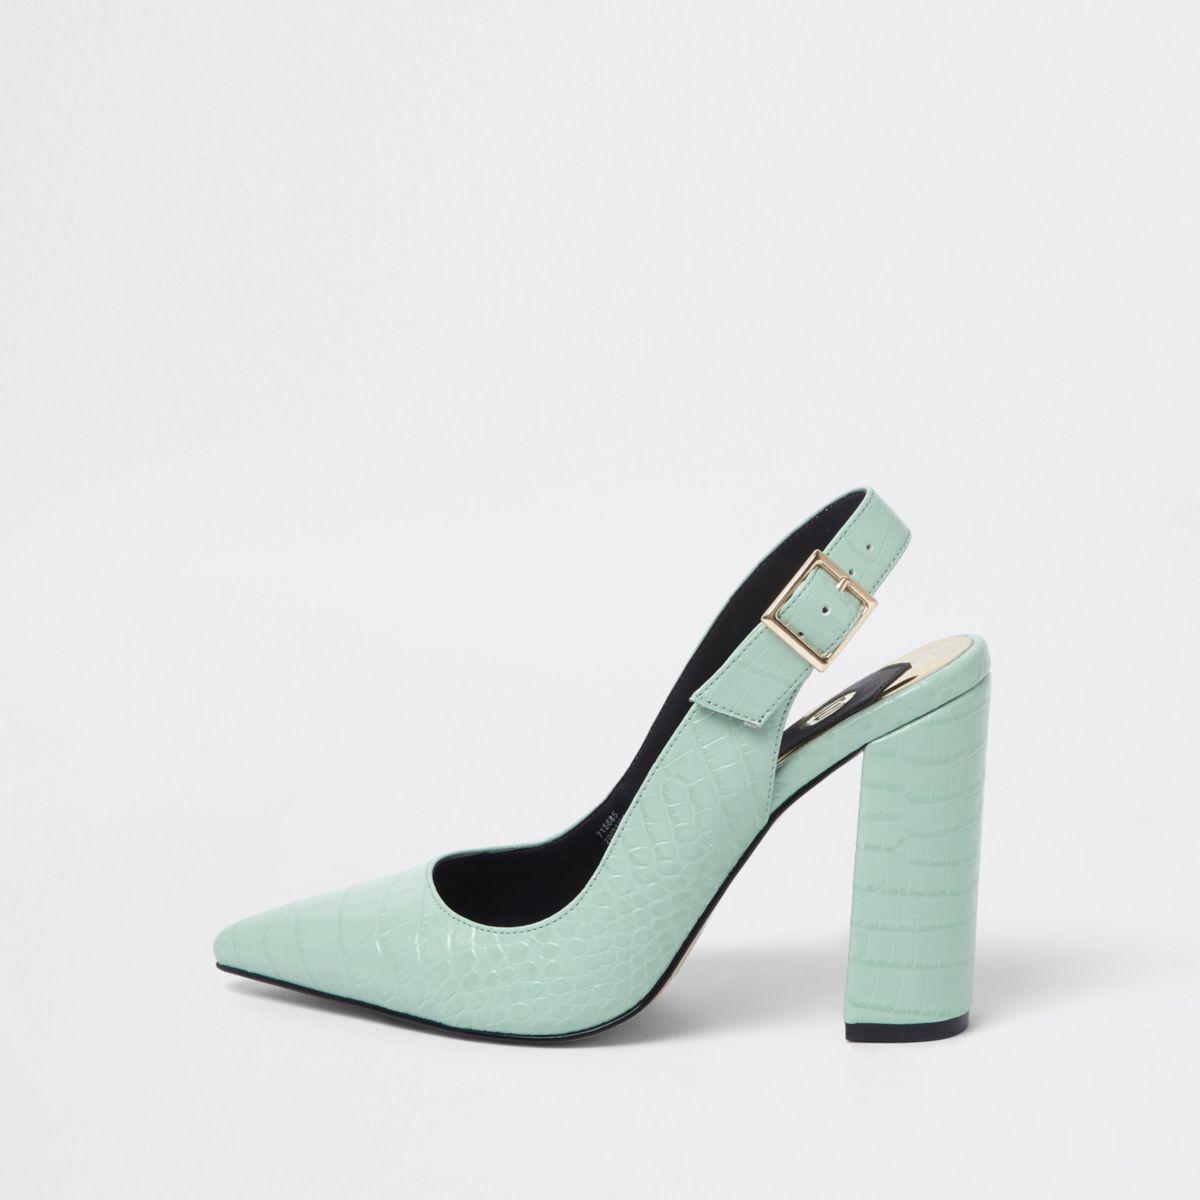 Green croc block heel sling back pumps